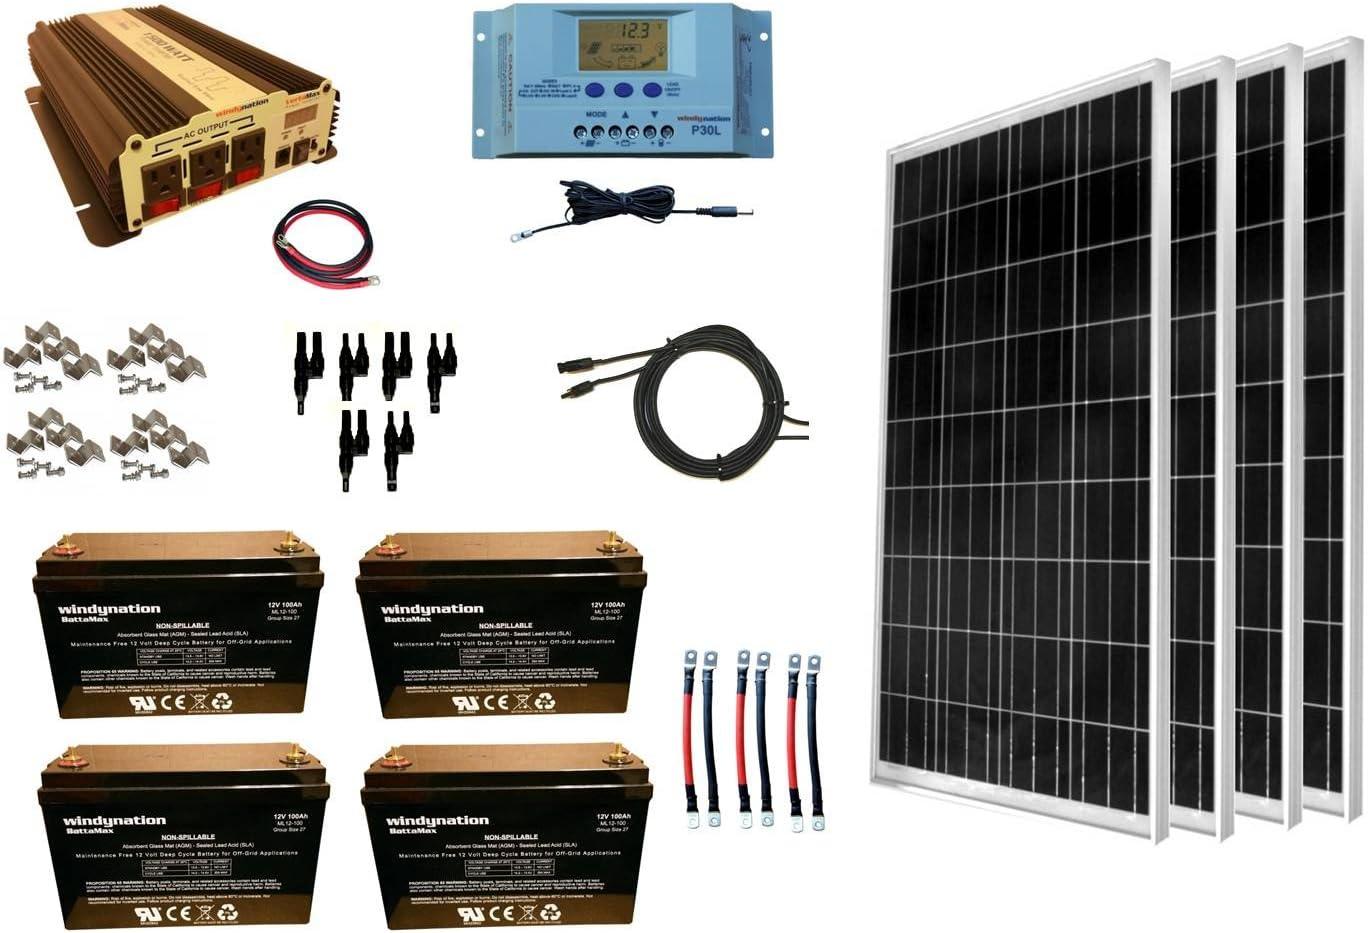 Amazon Com Windynation 400 Watt 4pcs 100w Solar Panel Kit 1500 Watt Vertamax Power Inverter Agm Battery Bank For Rv Boat Cabin Off Grid 12 Volt Battery System Garden Outdoor